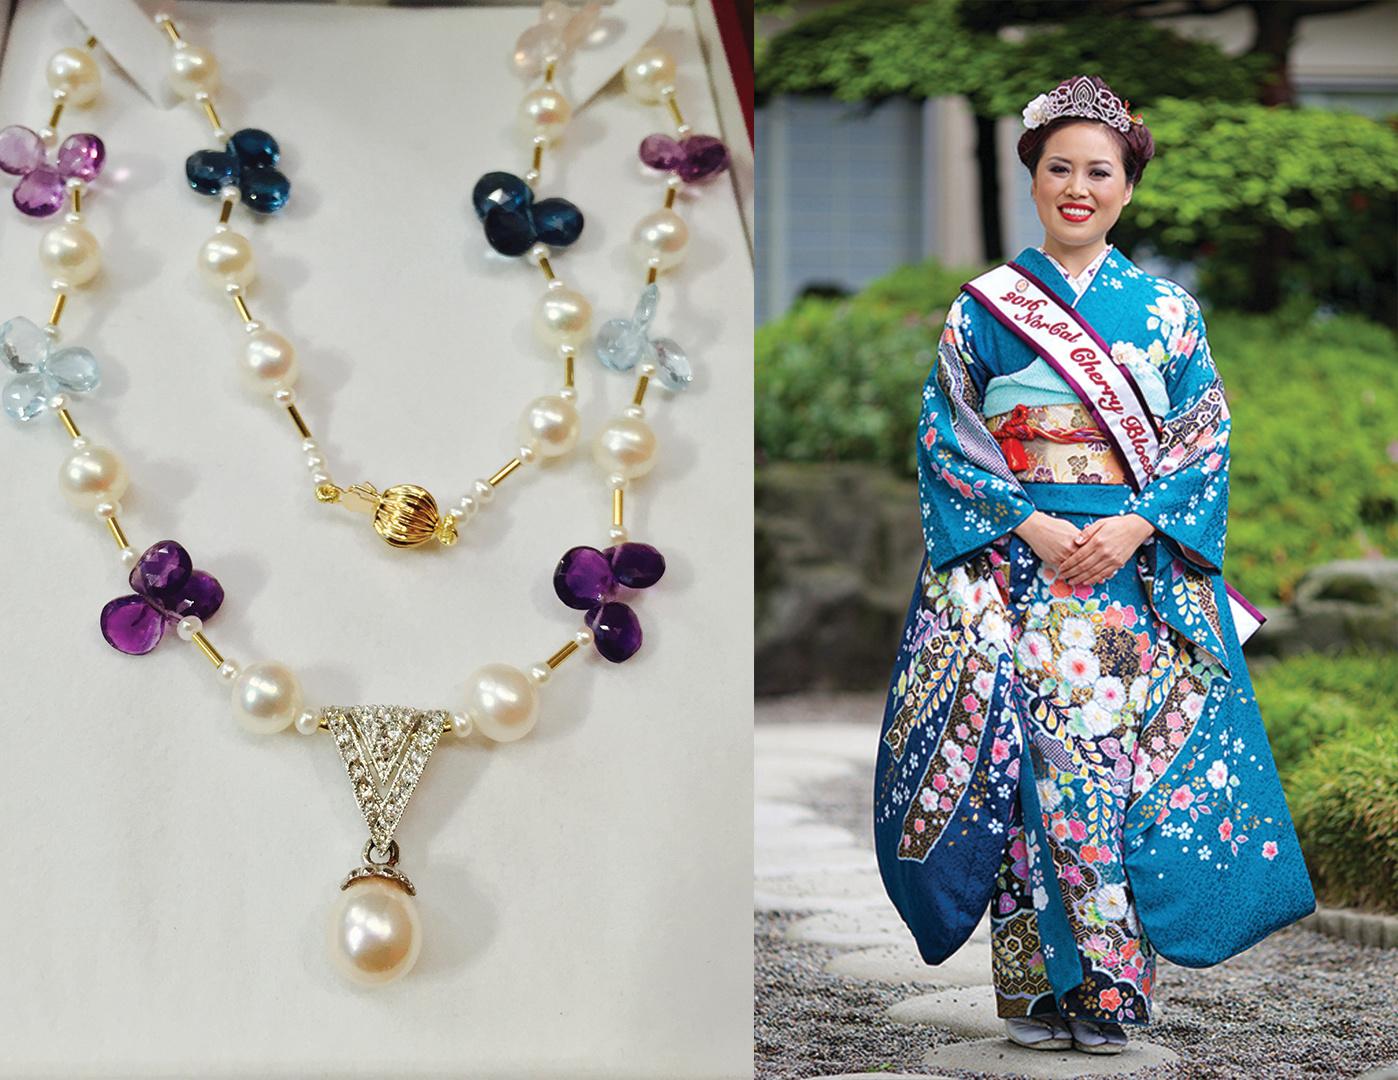 2016 1st Princess Marisa Sum